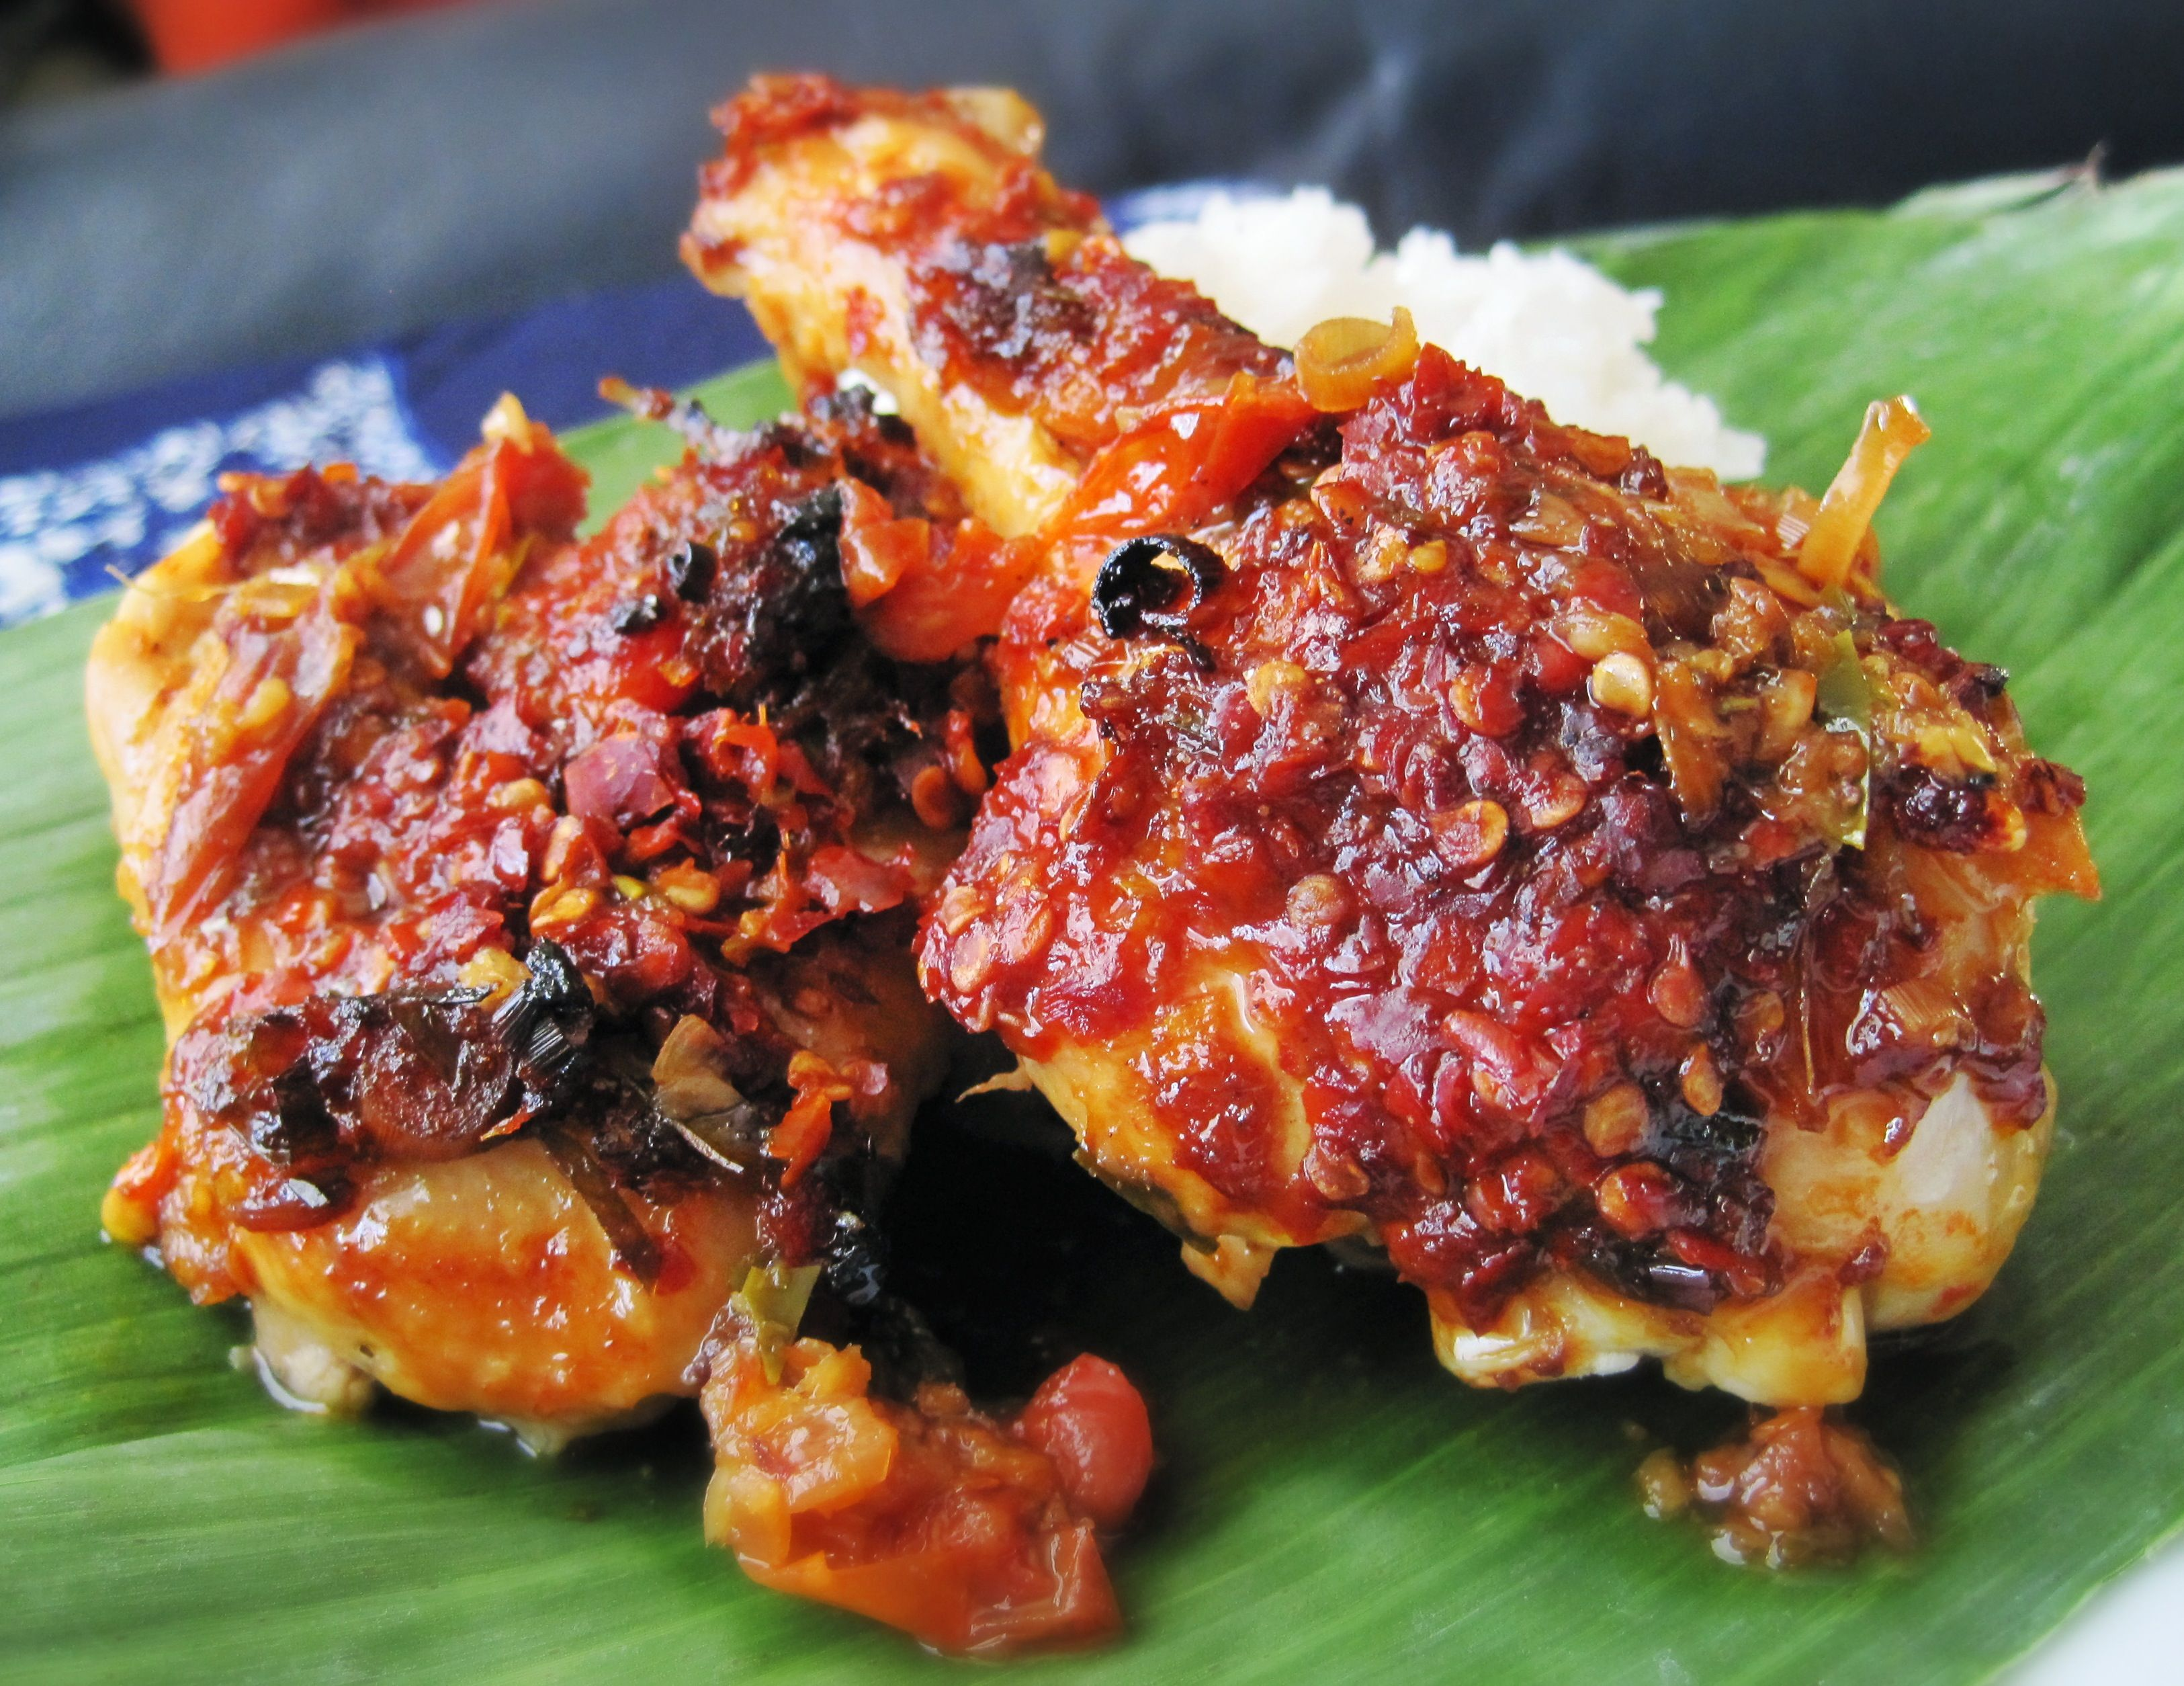 Indonesian Food. Ayam Bumbu Bali. Balinese Spicy Roasted Chicken